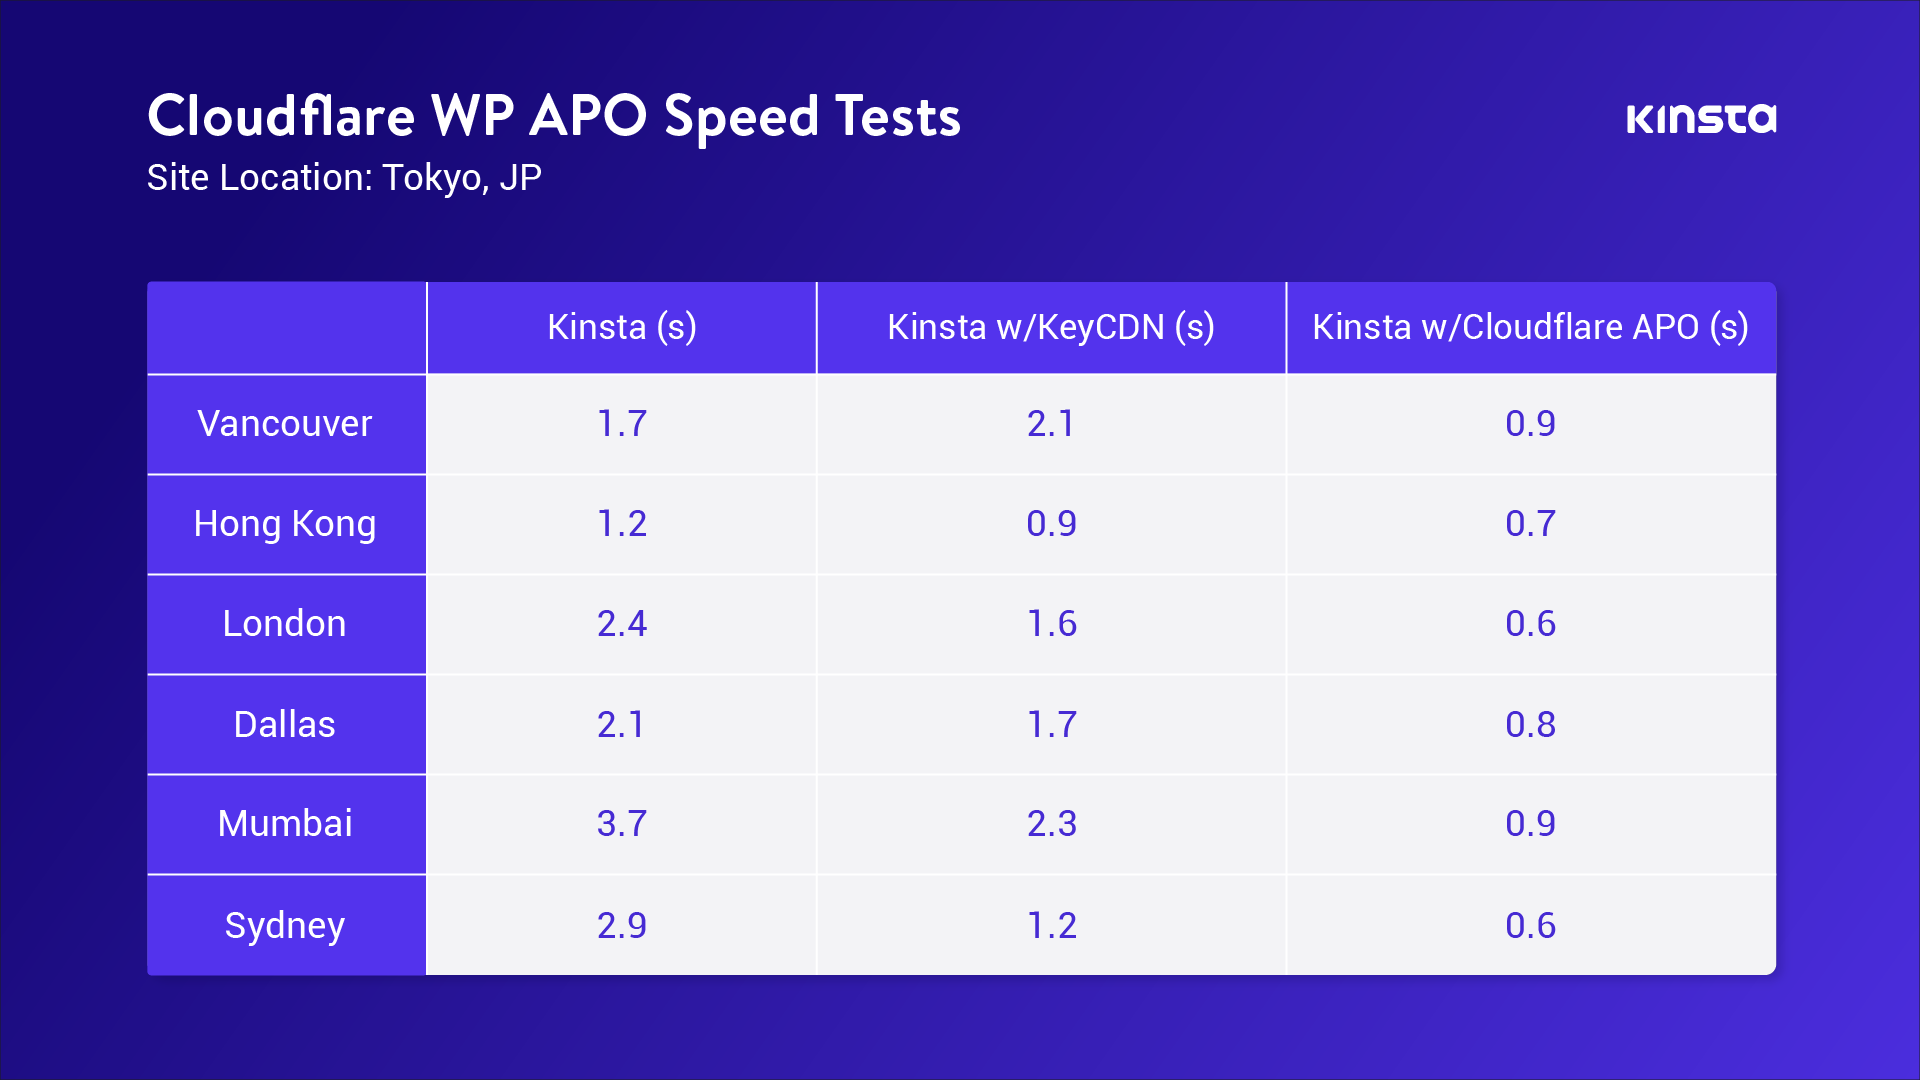 CloudflareのAPOを有効にすると、WordPressのパフォーマンスが最大300%向上した